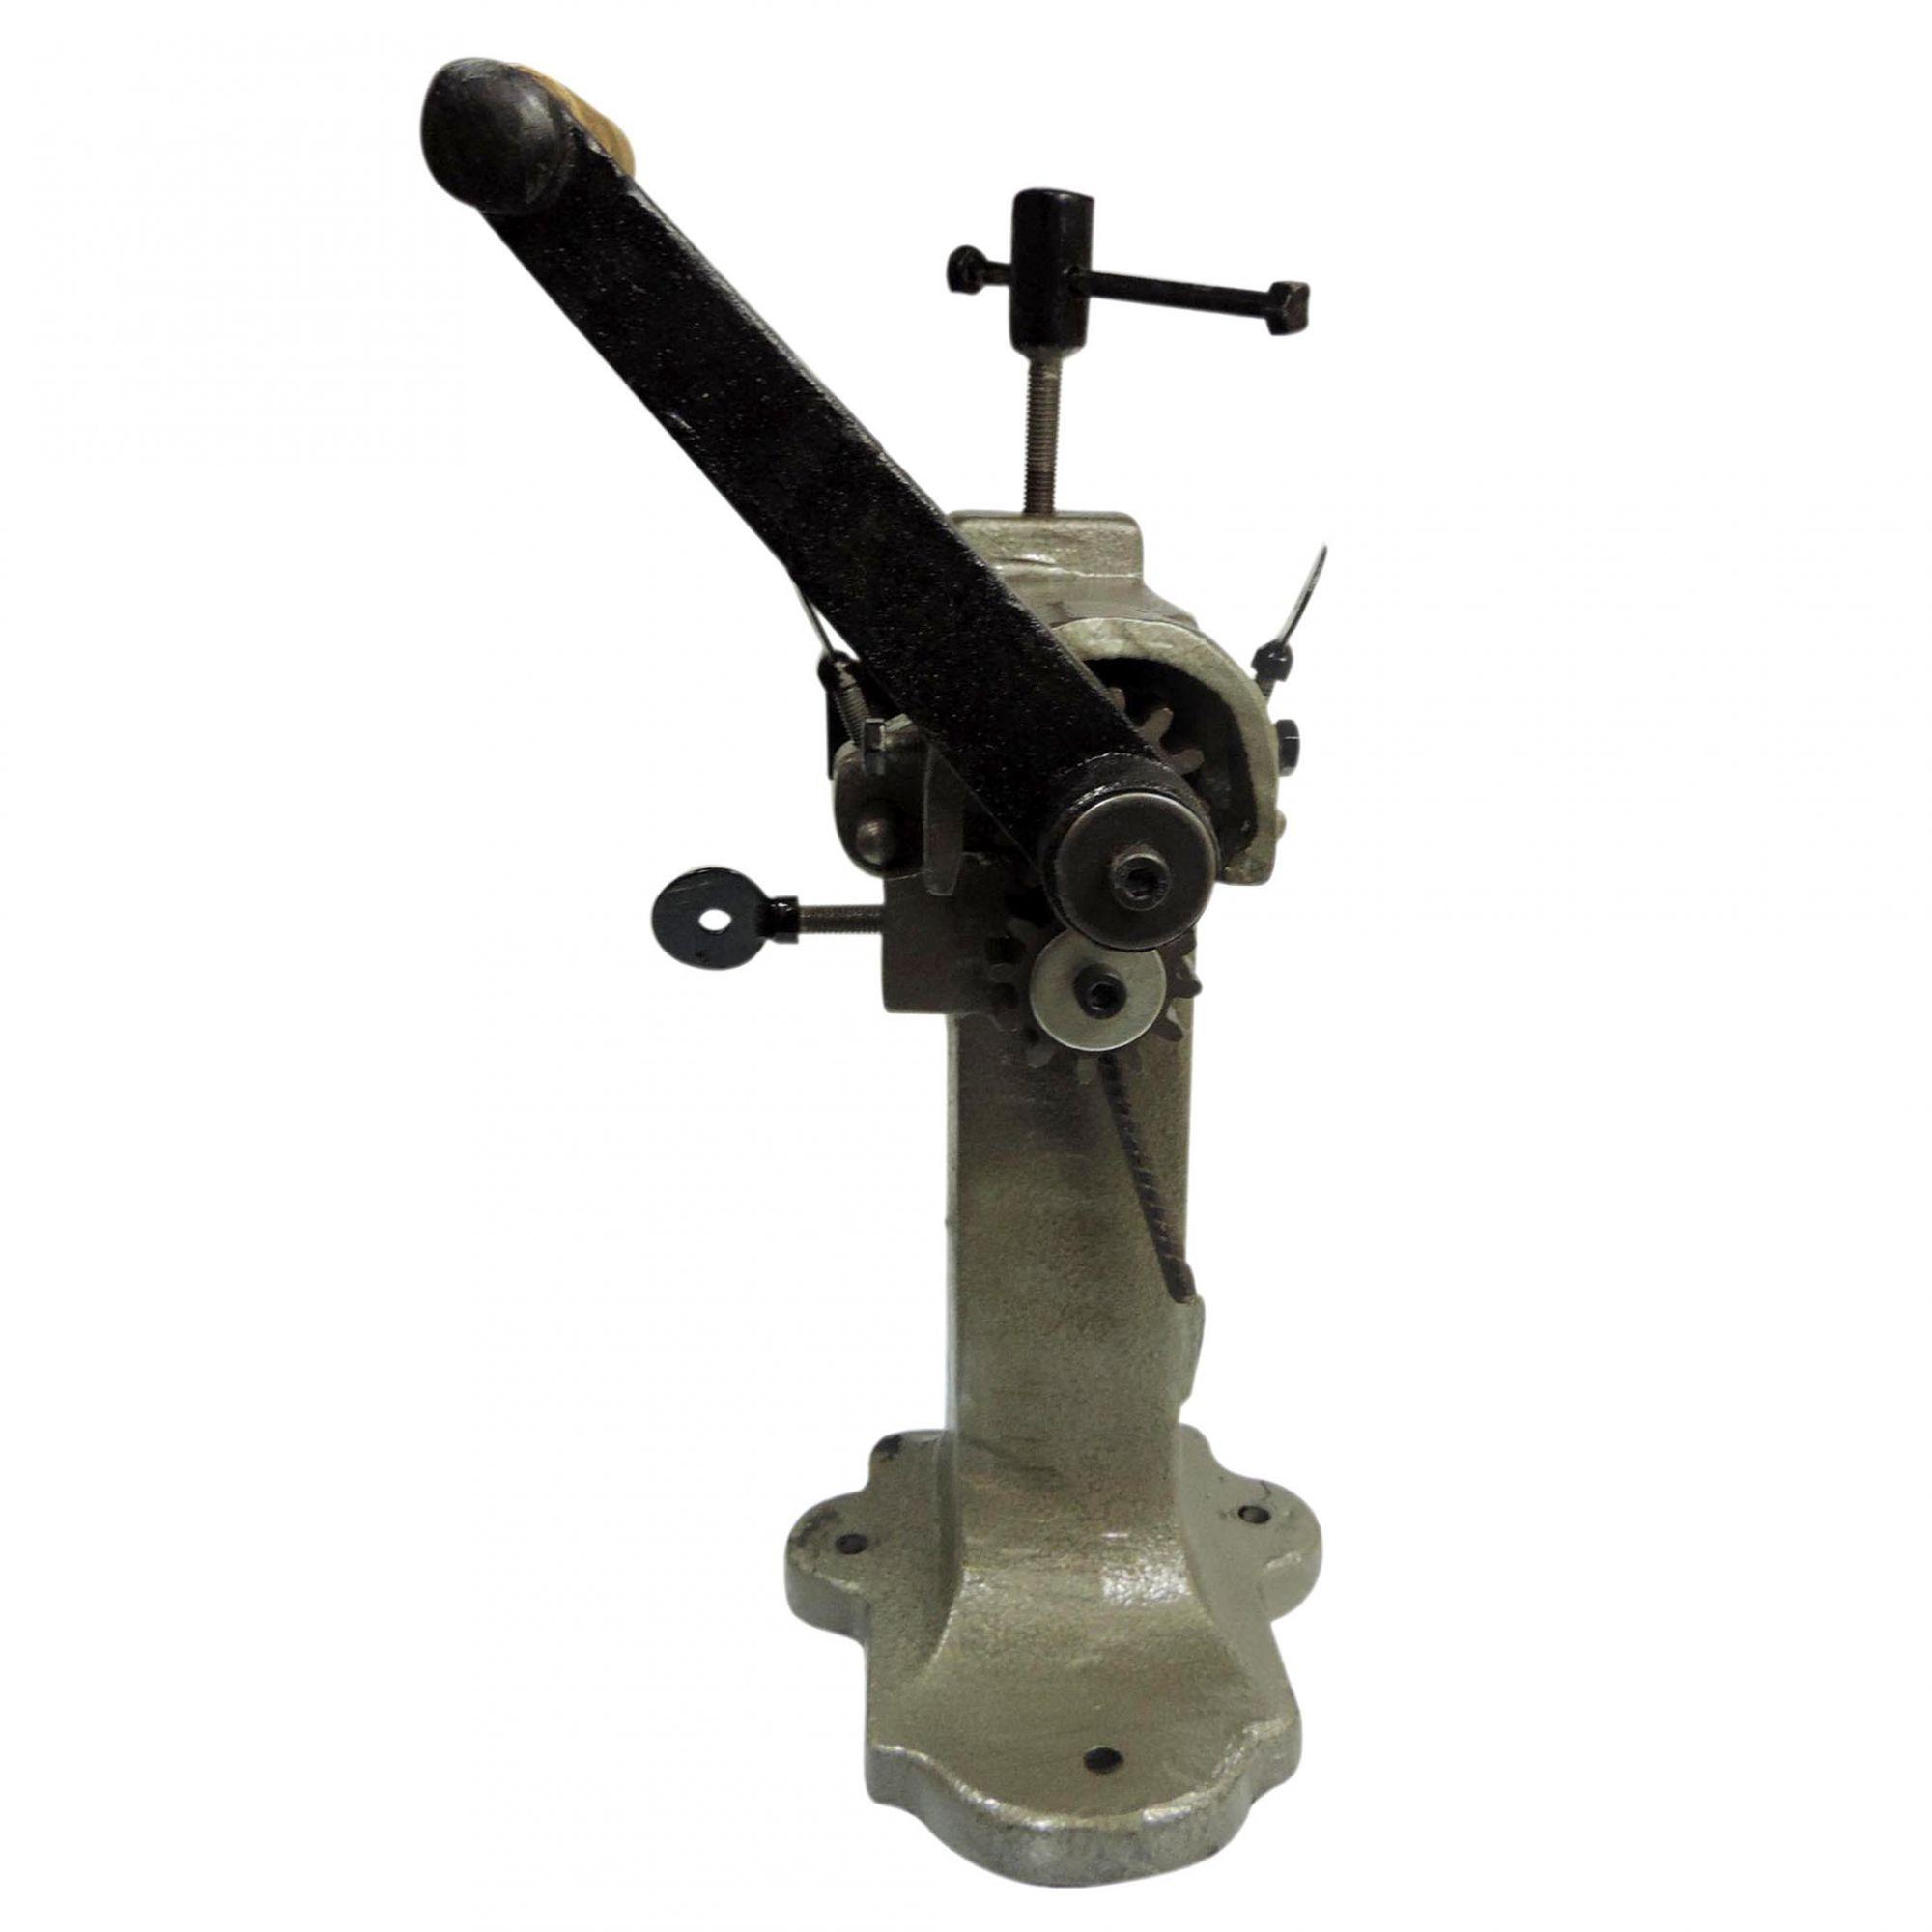 Frisadeira para Chapas - Modelo VEGA-3